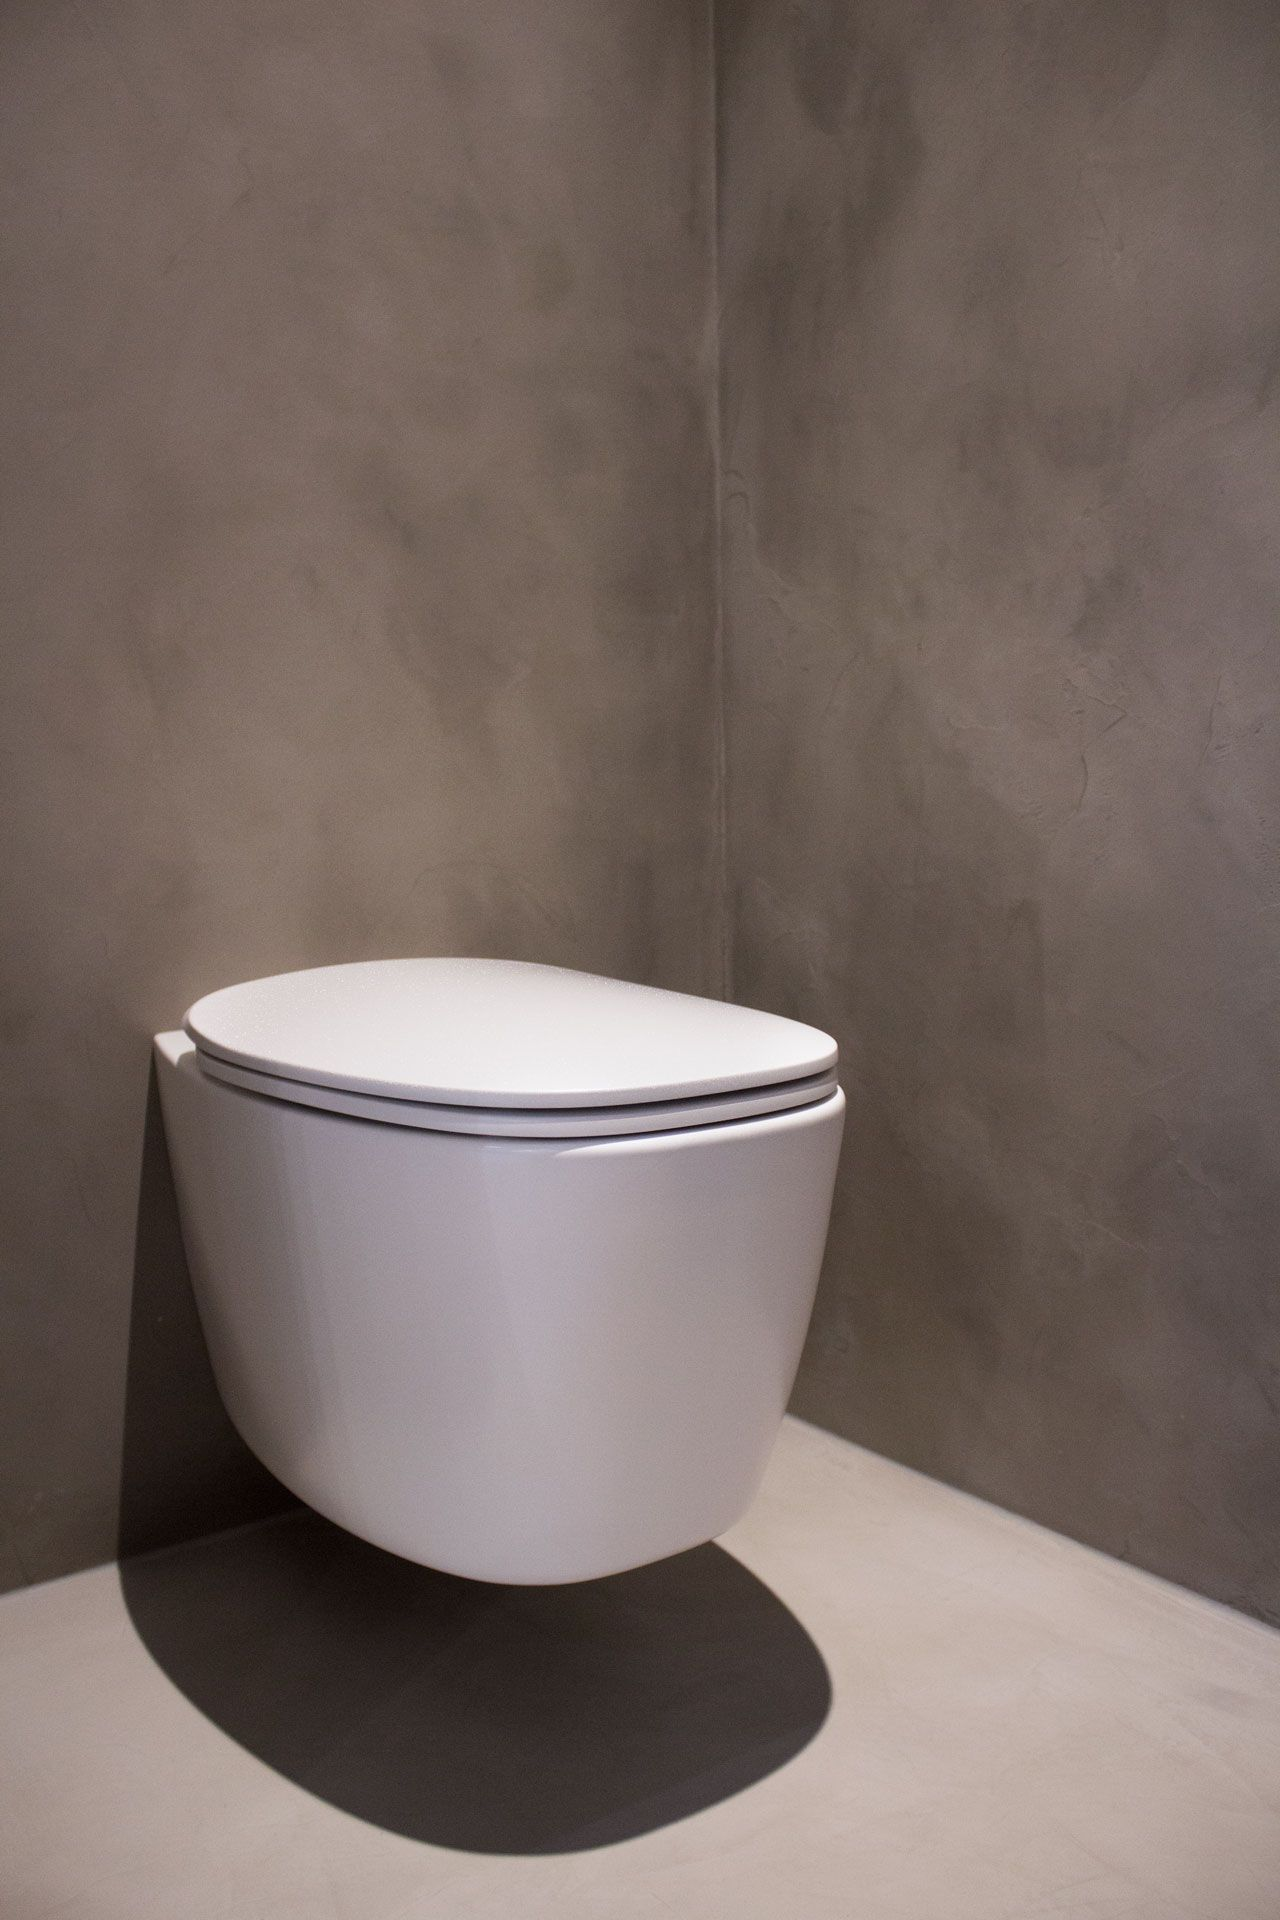 Ideal Standard Dea Wandcloset Diepspoel Mat Wit Met Randloze Spoeling 1208581202 Beton Look Ideal Standard